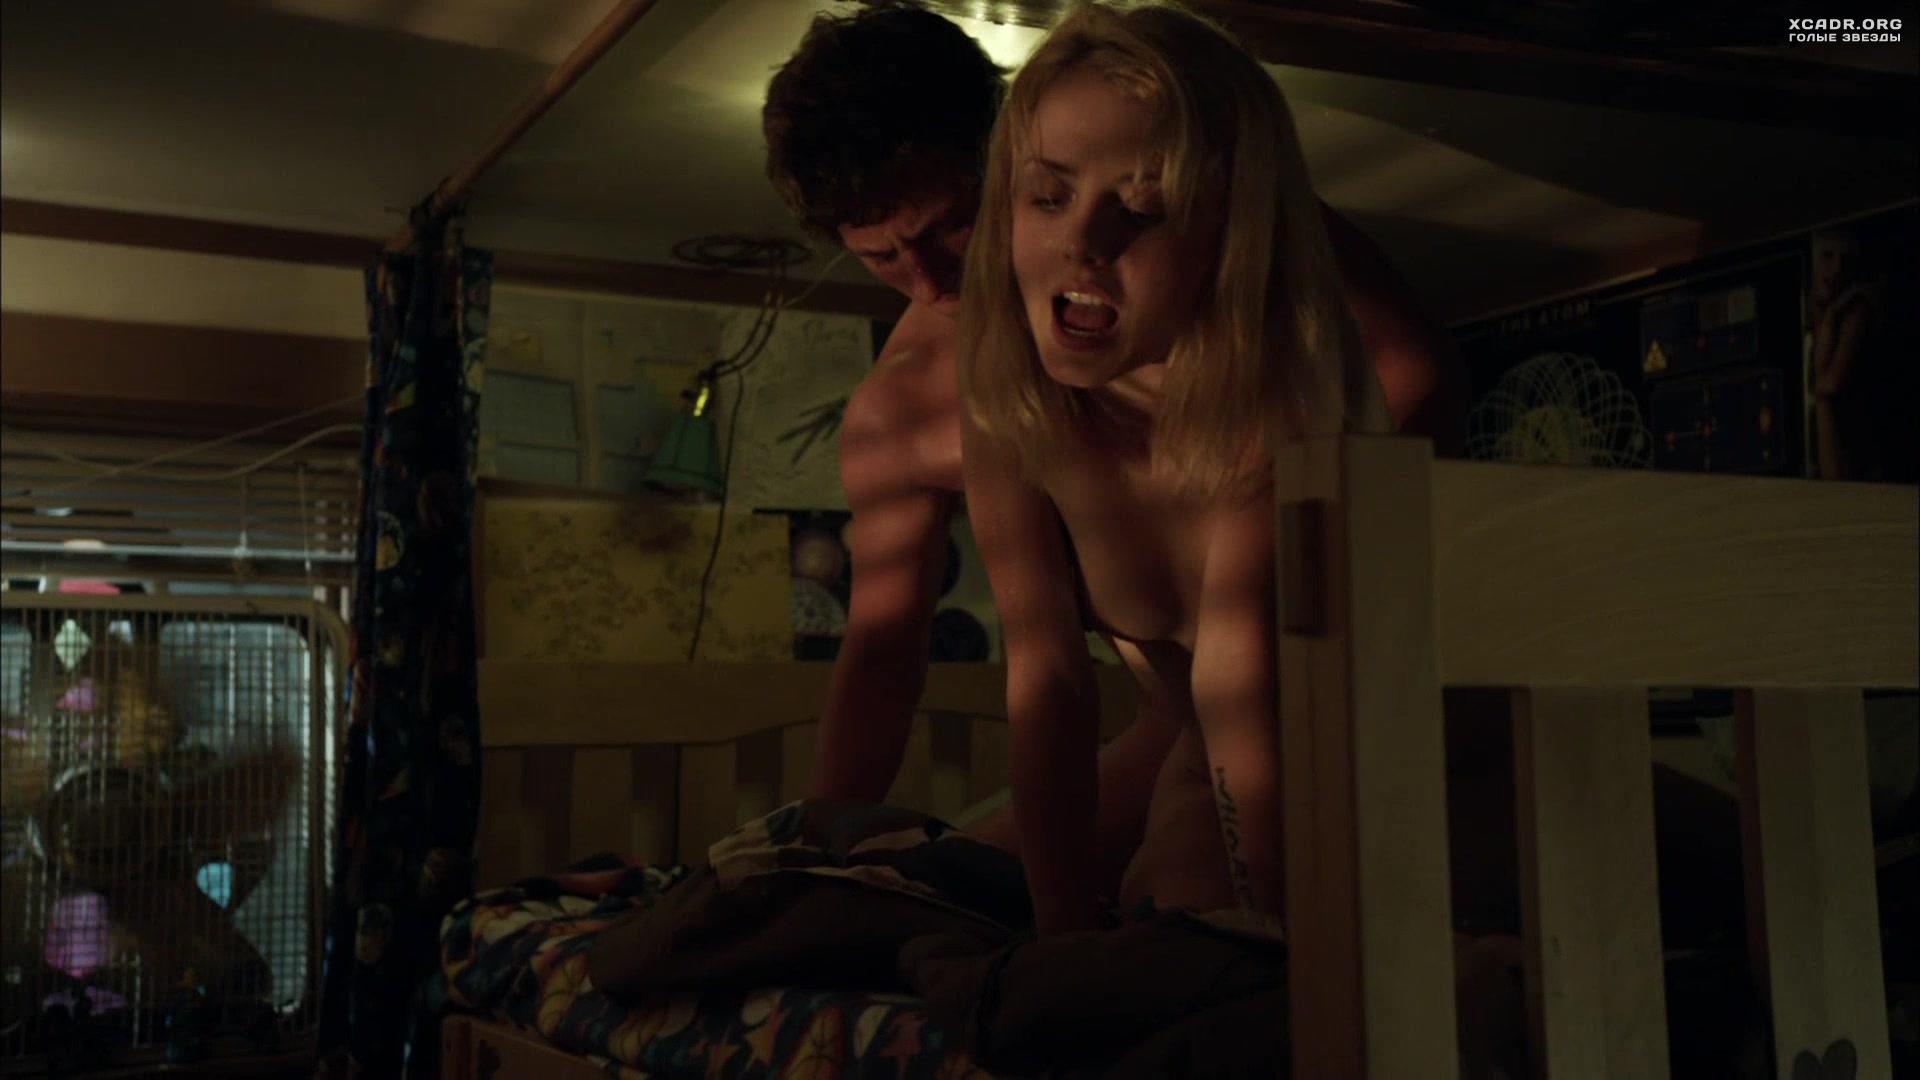 Laura fraser nuda naked pic